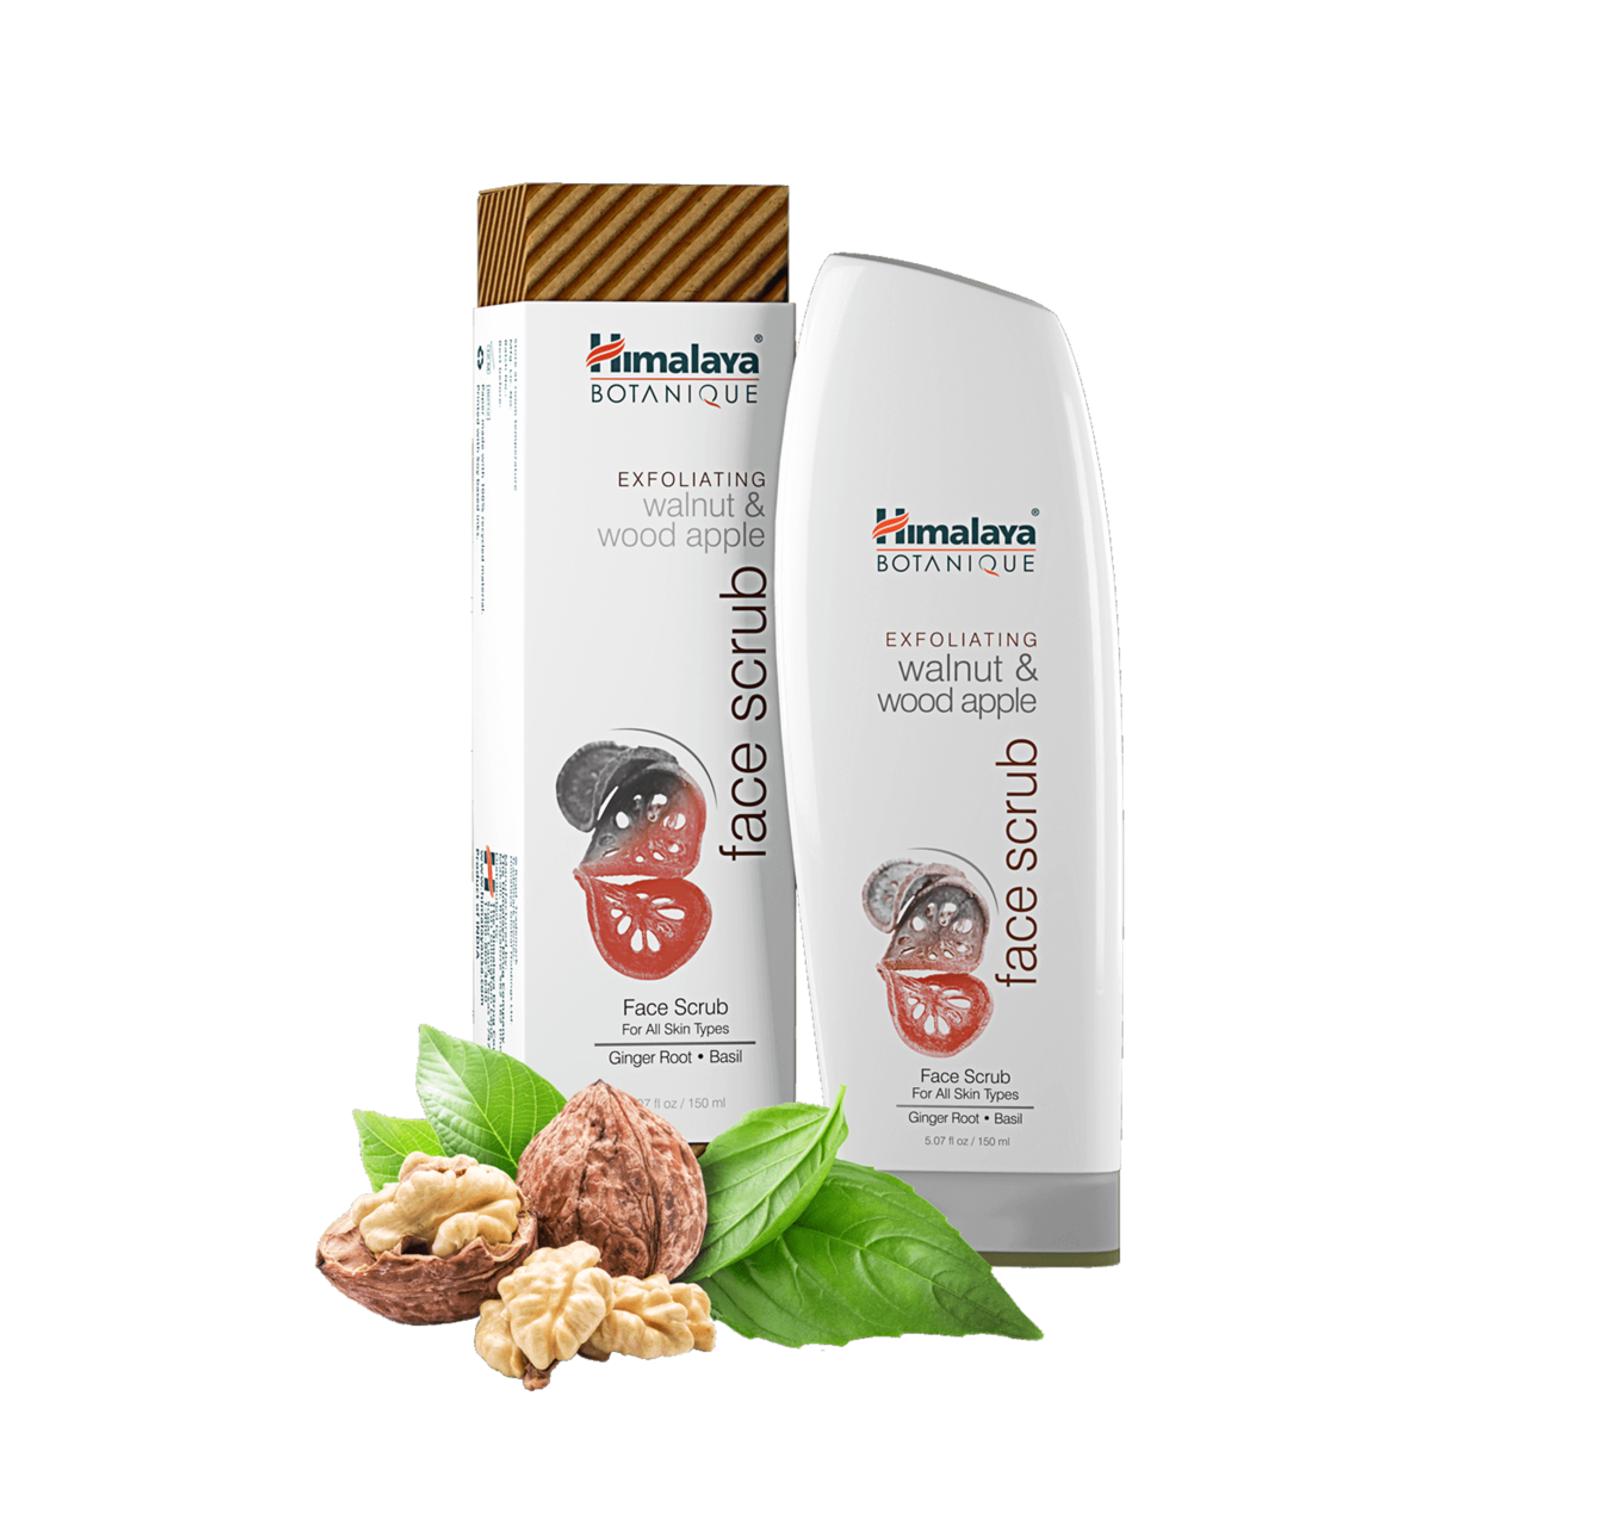 Himalaya Face Scrub: Exfoliating (Walnut & Wood Apple) 150ml